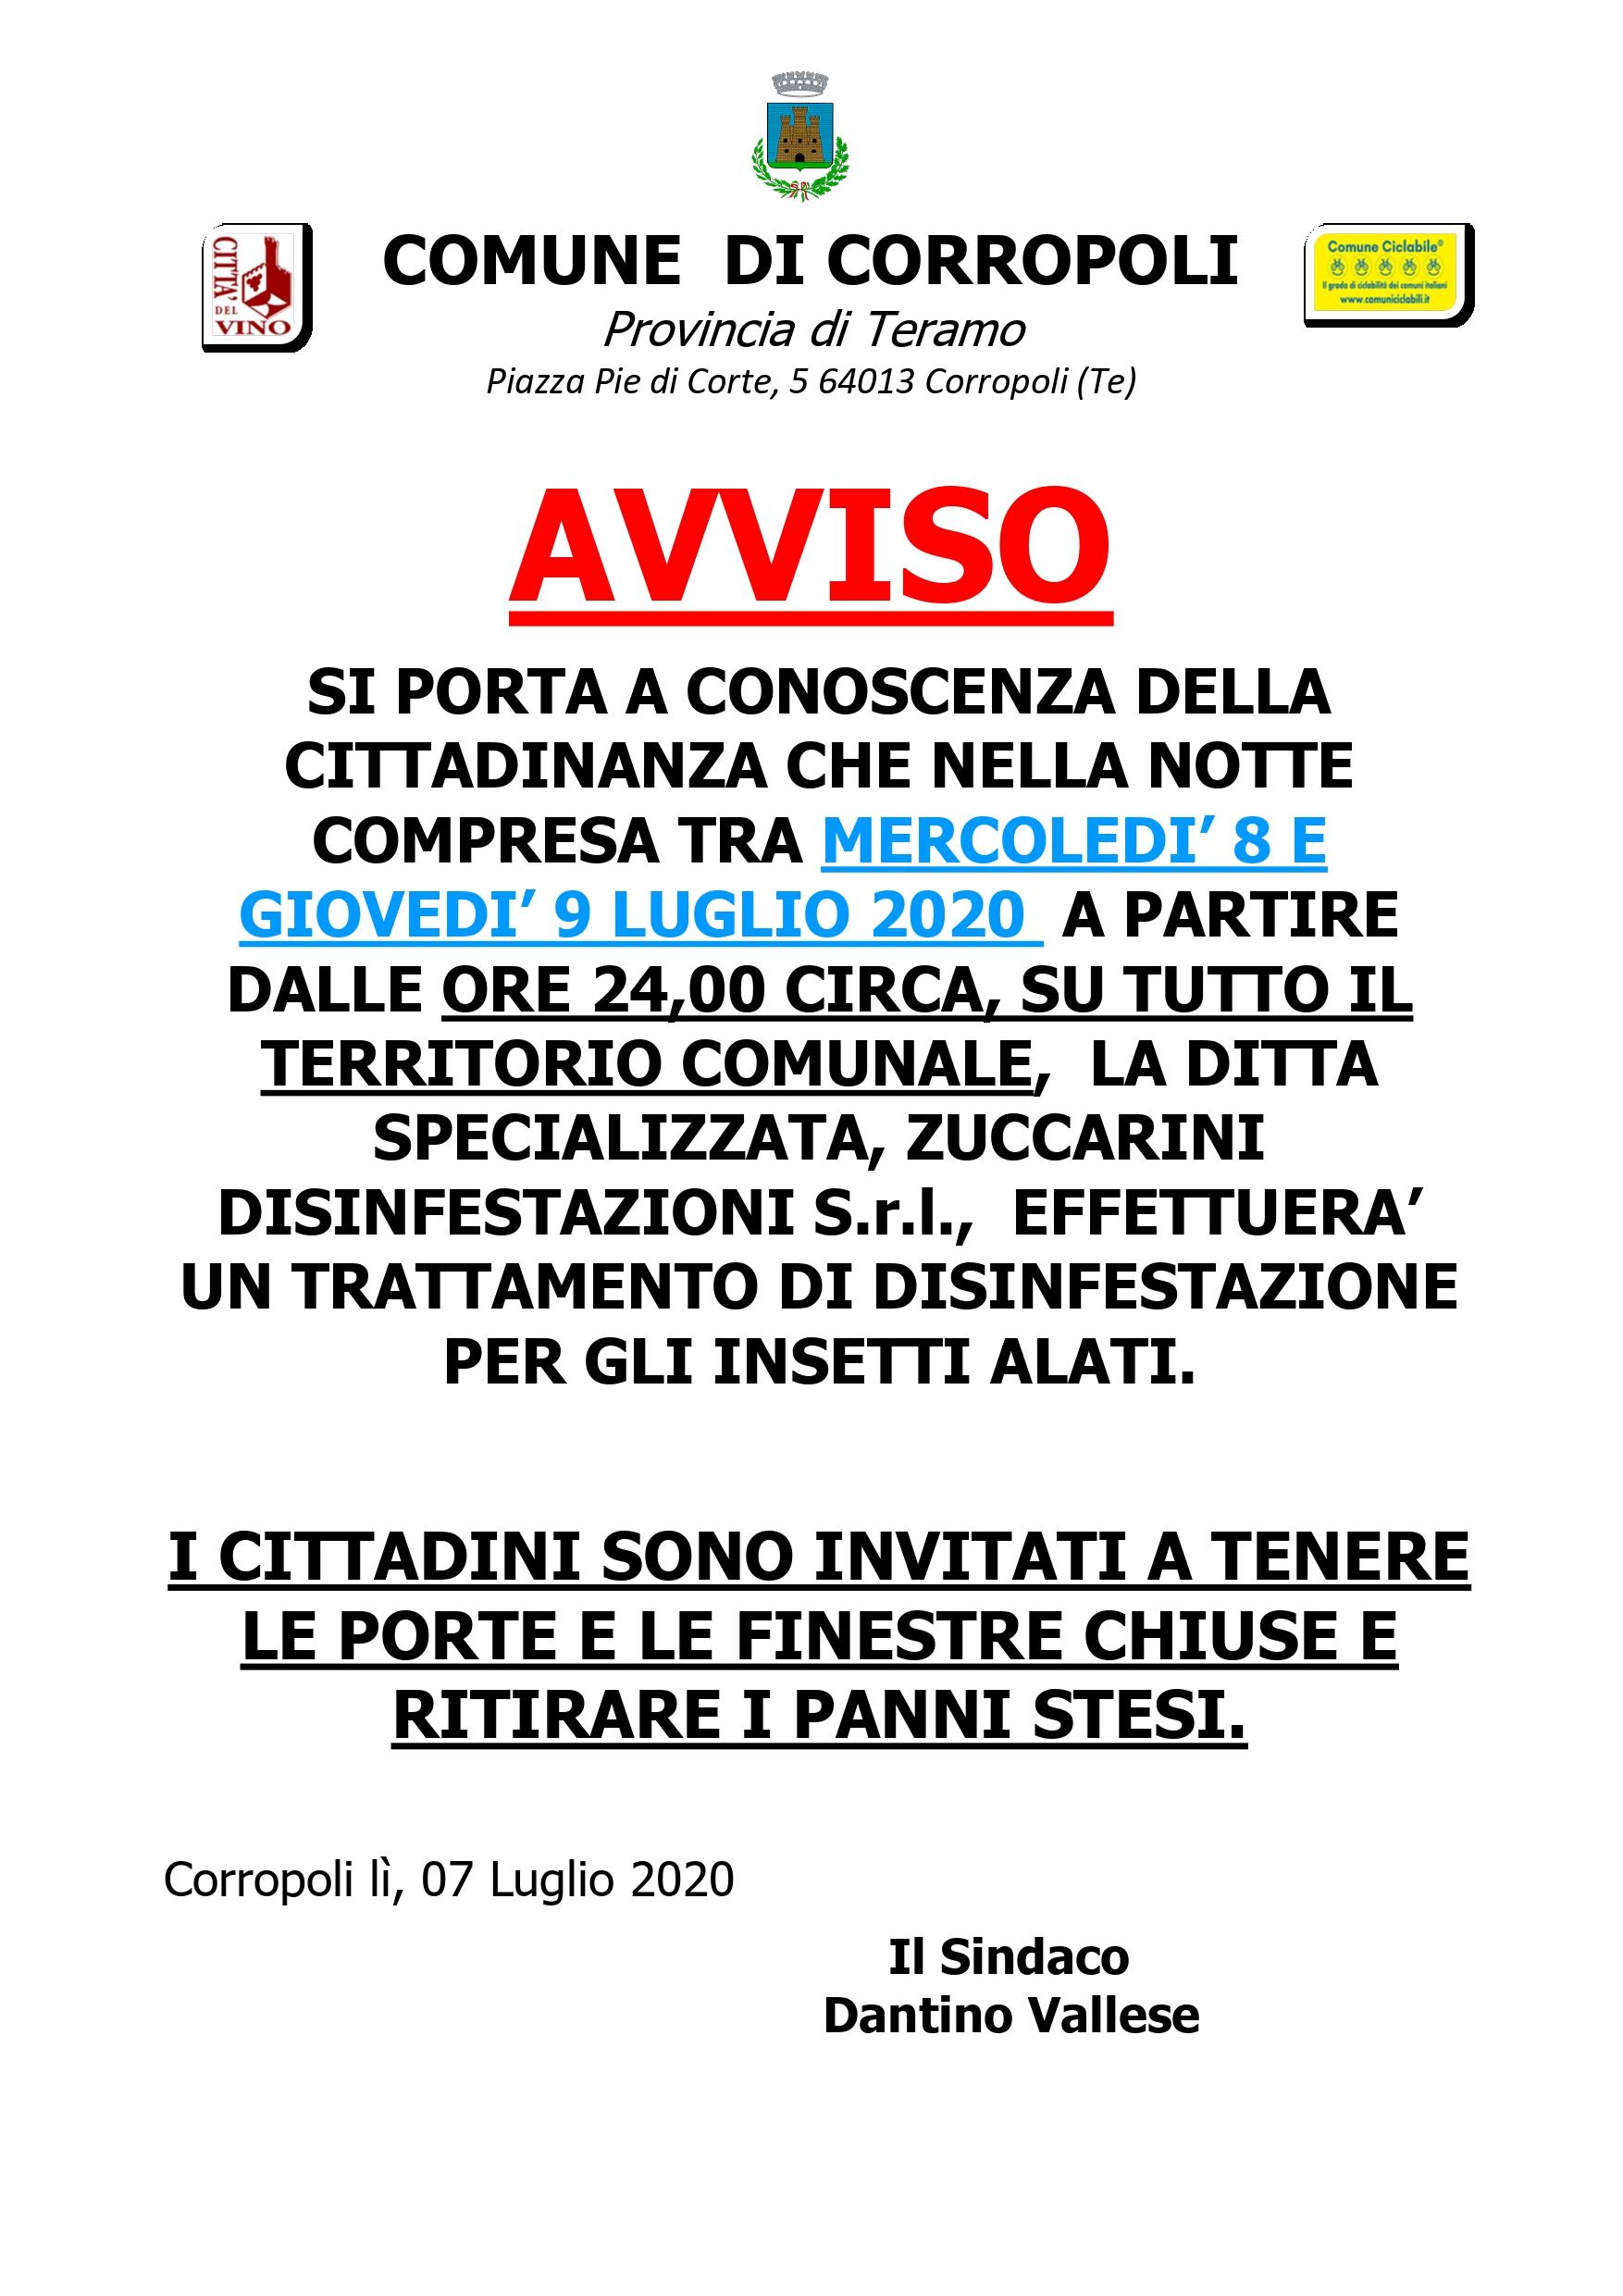 https://www.comune.corropoli.te.it/images/02.Avviso_page-0001.jpg